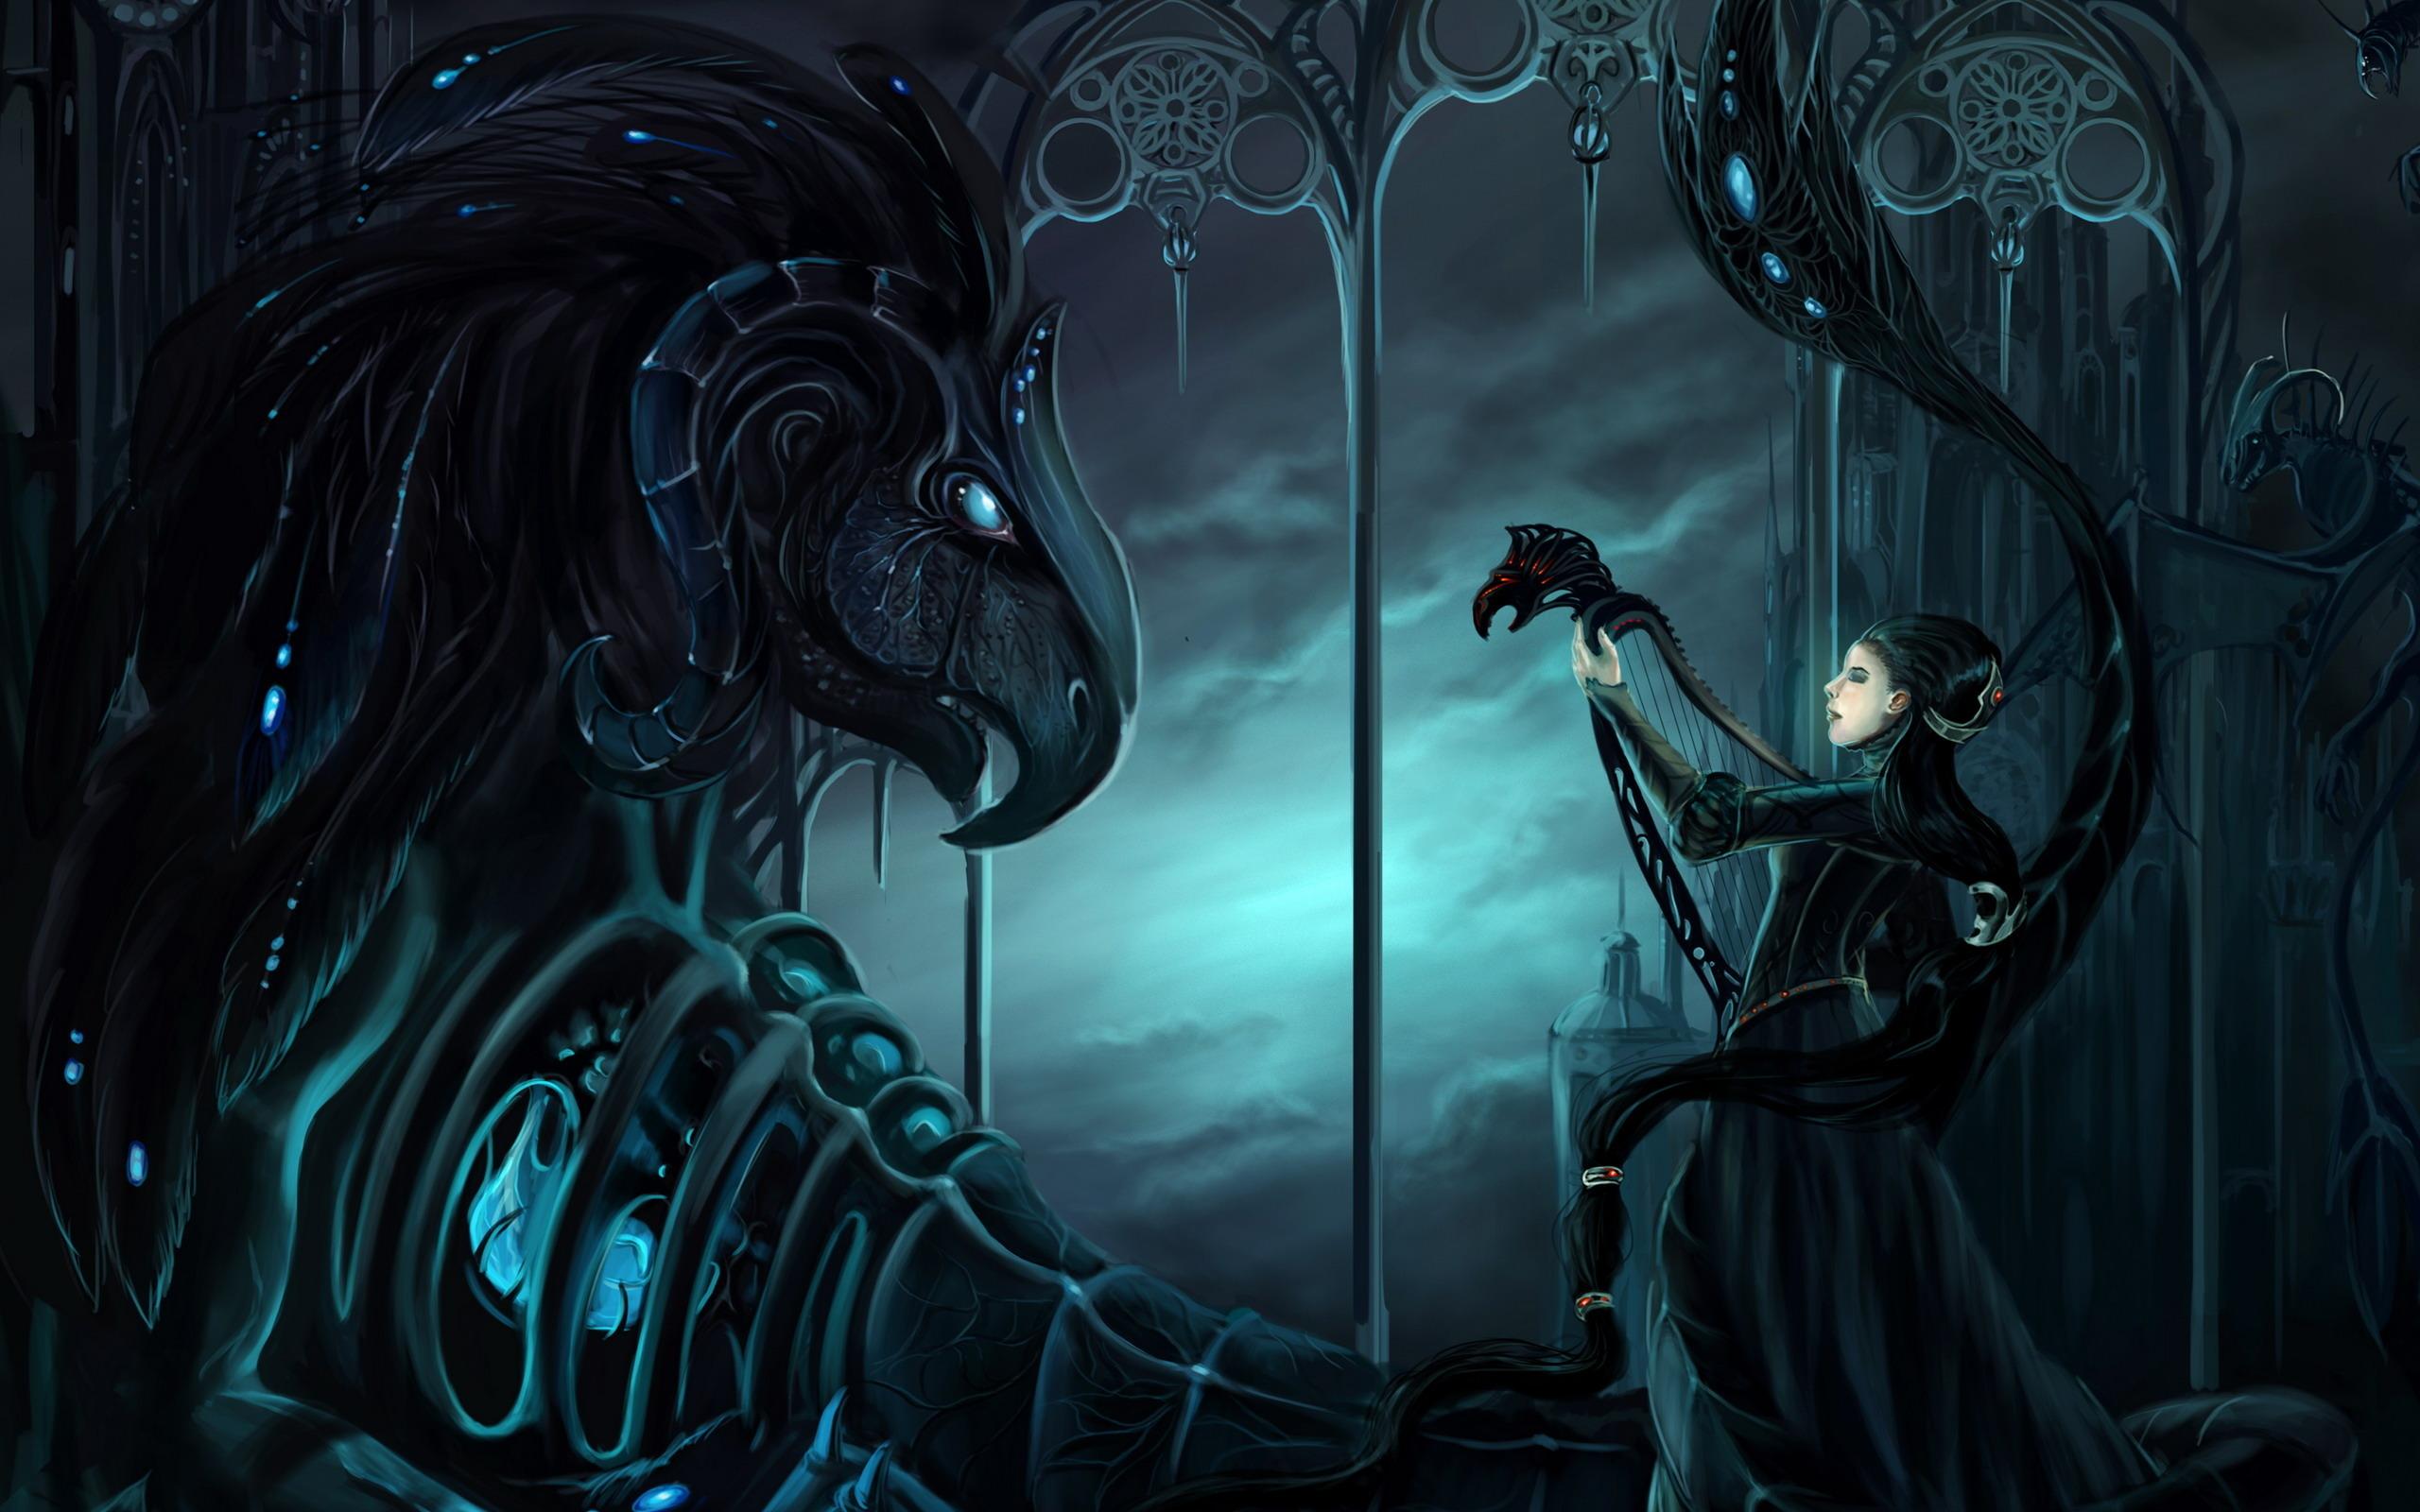 gothic fantasy art dark mech dragons women females mood wallpaper 2560x1600